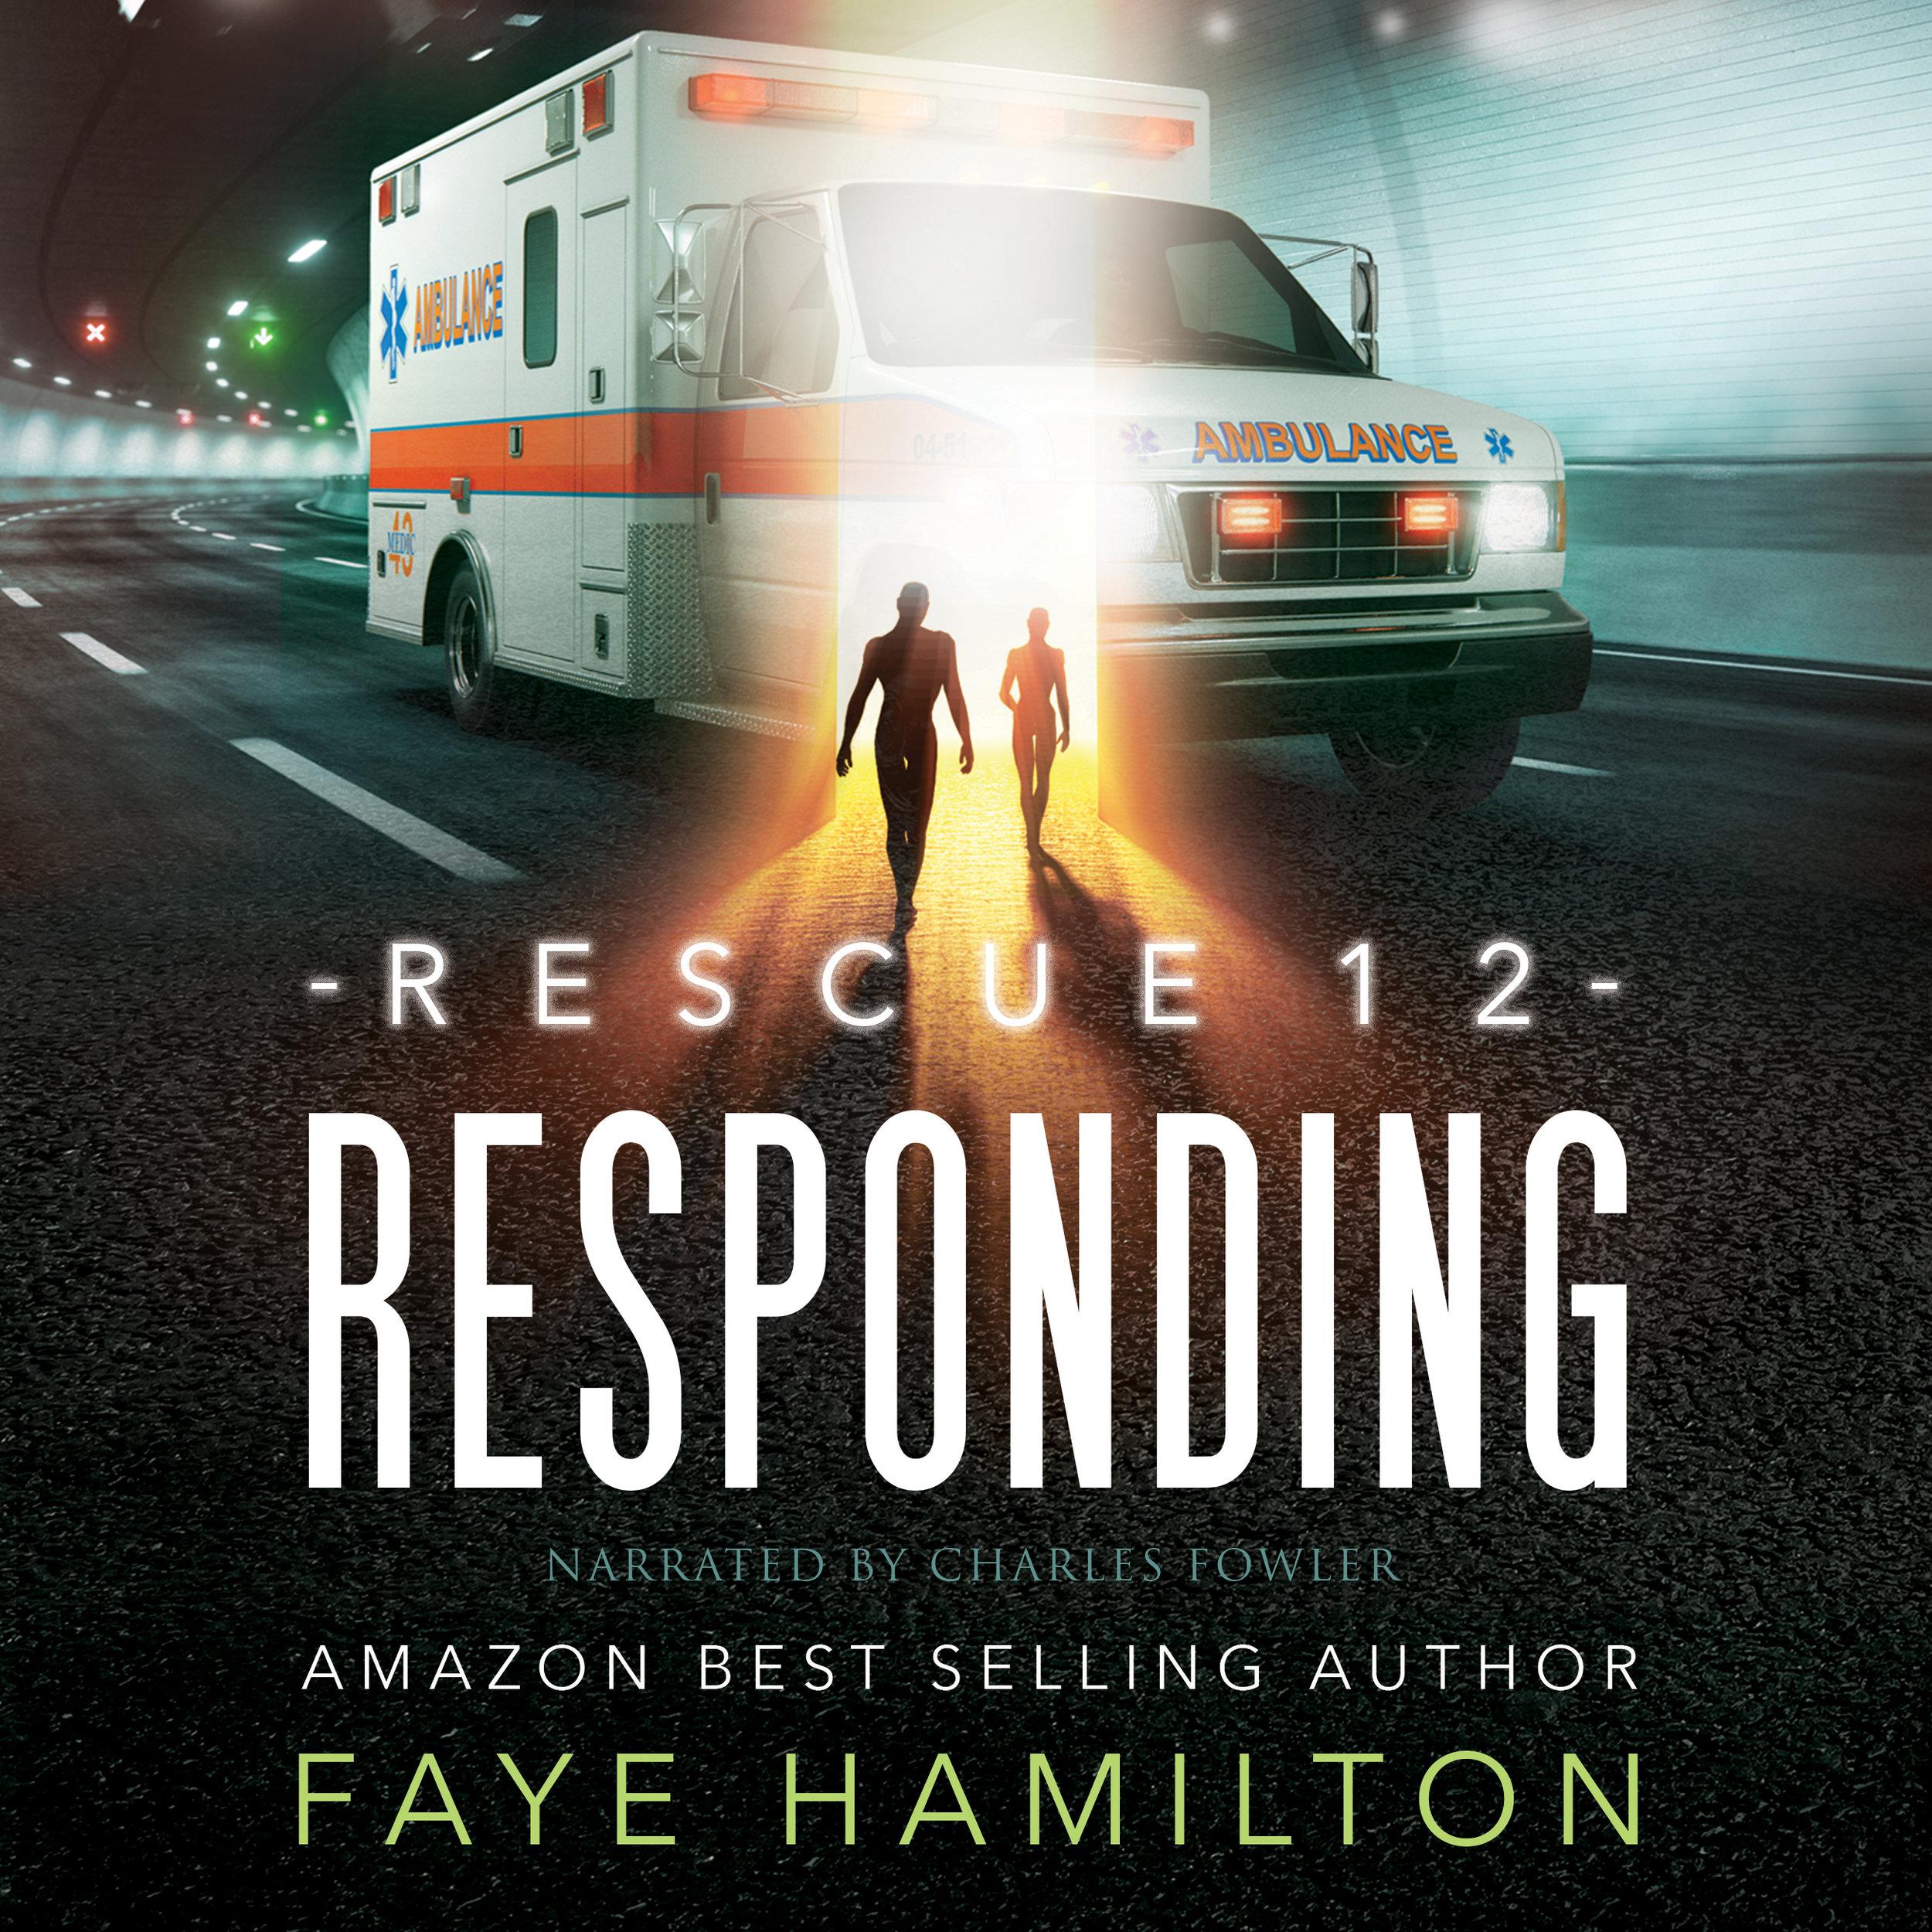 Audible Rescue 12 Responding by Faye Hamilton (1).jpg